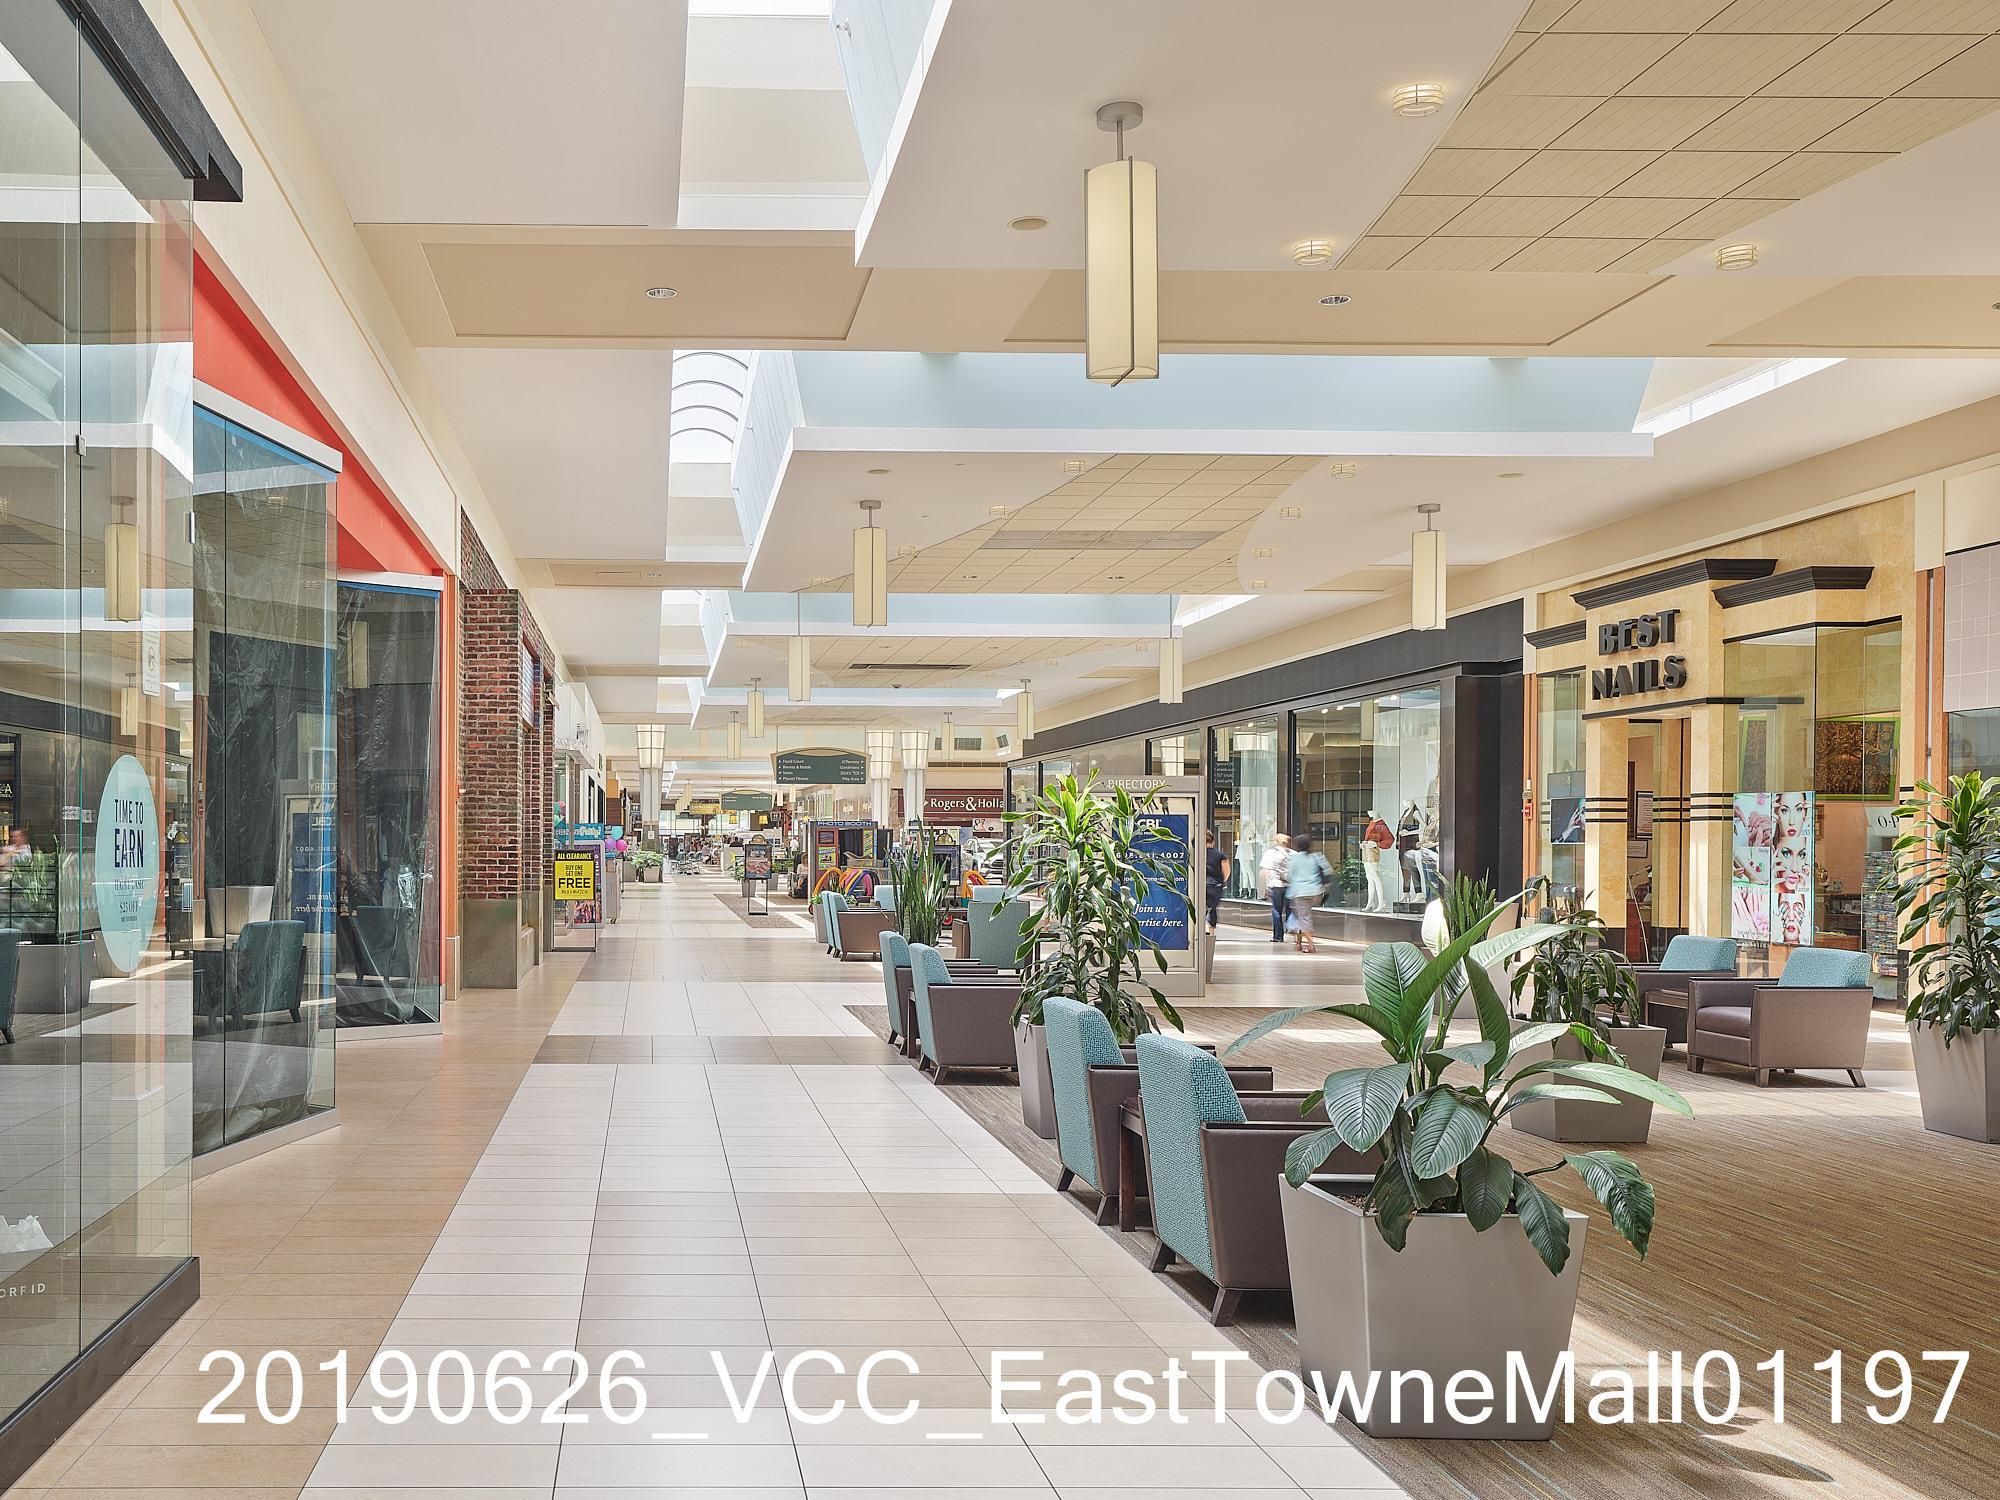 20190626_VCC_EastTowneMall01197.jpg